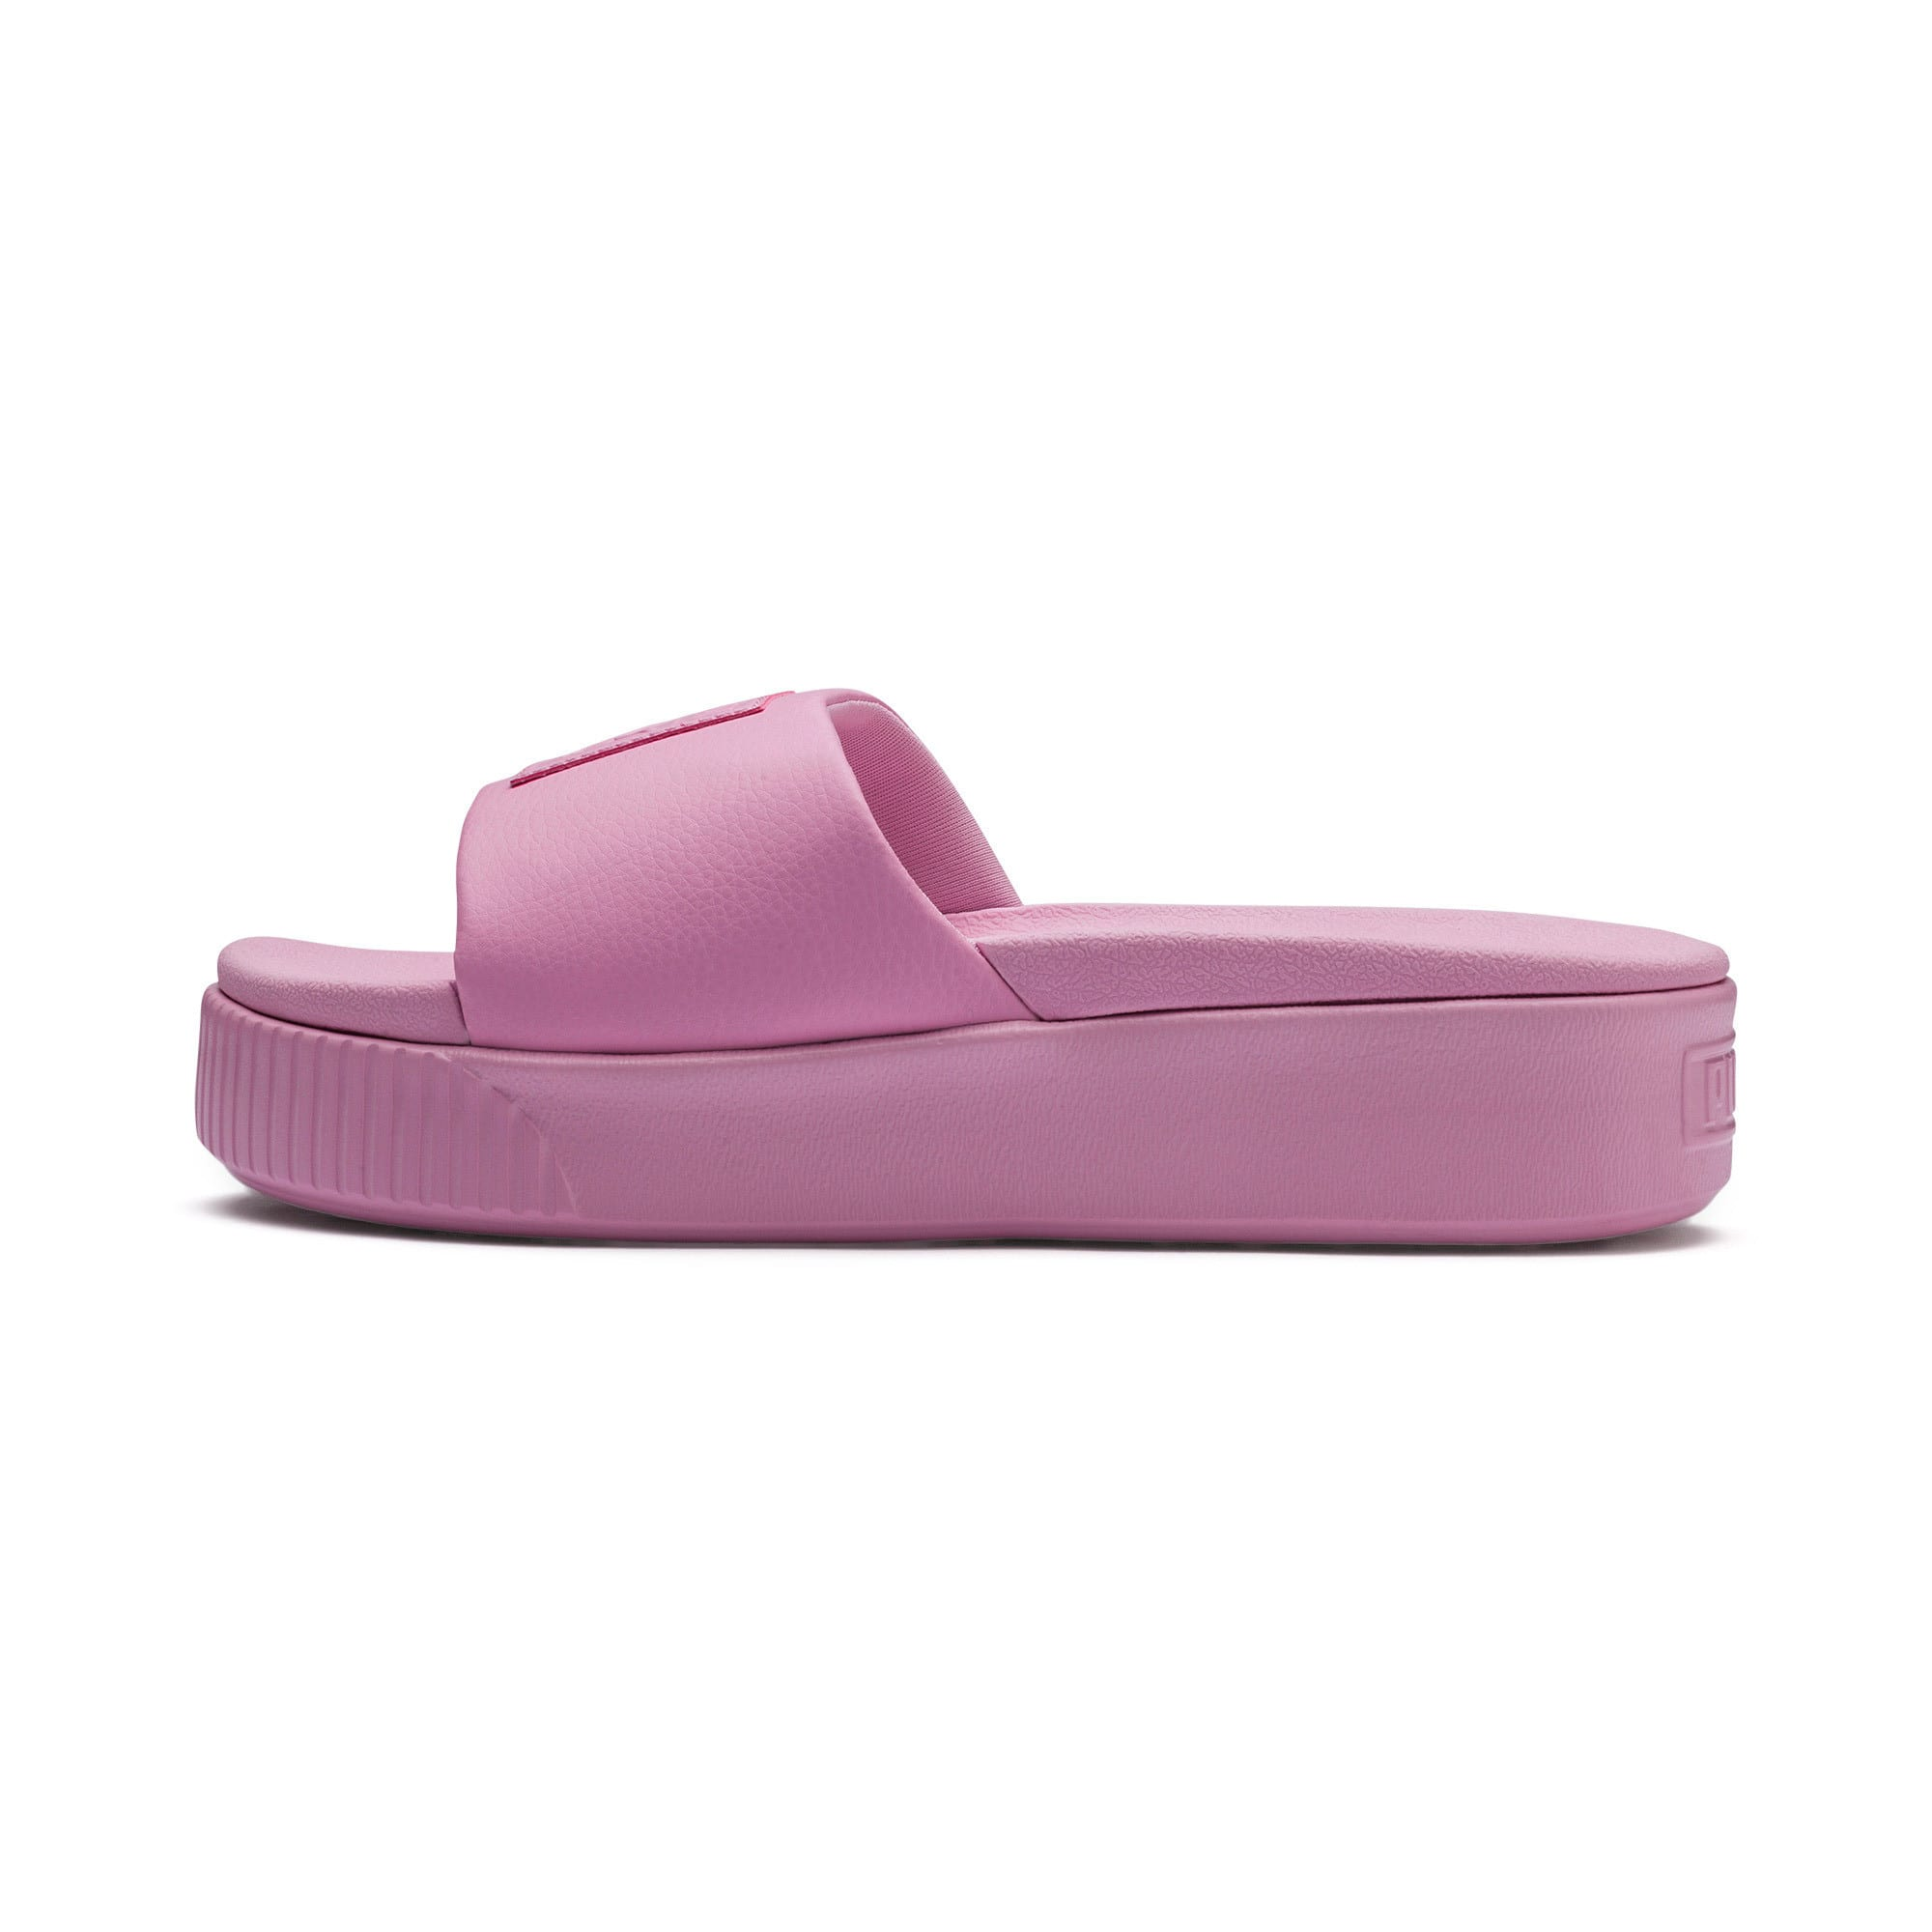 Thumbnail 1 of Platform Slide Women's Sandals, Pale Pink-Pale Pink, medium